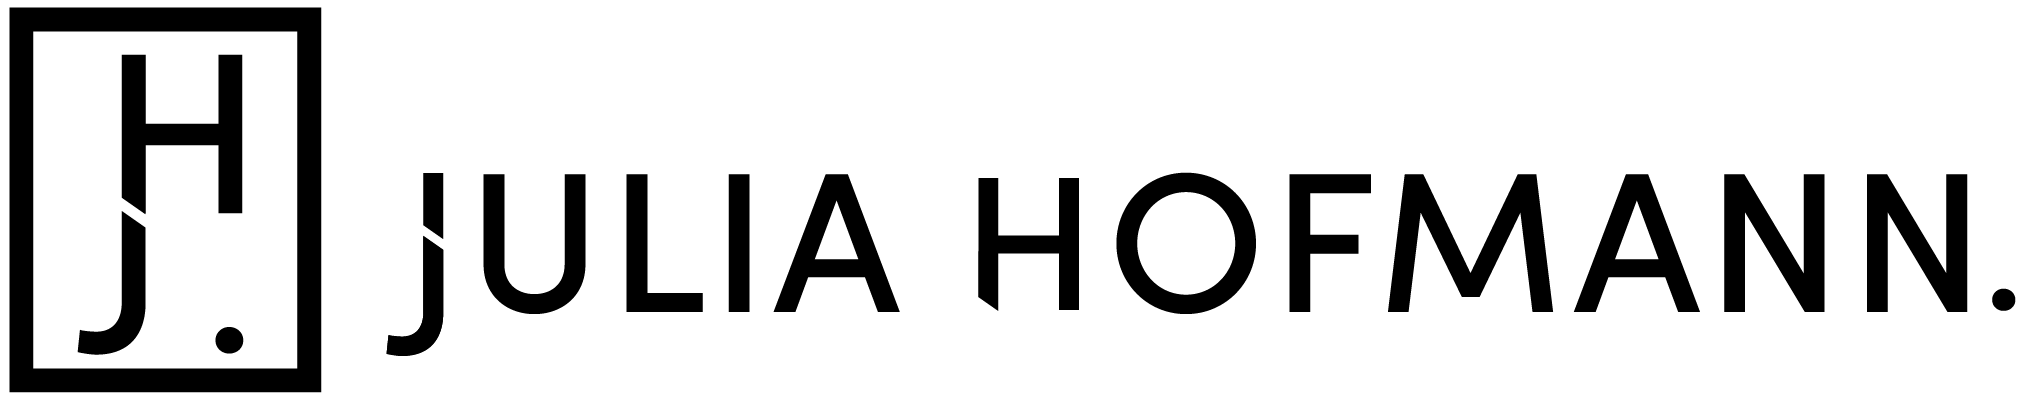 JuliaHofmann_Logo